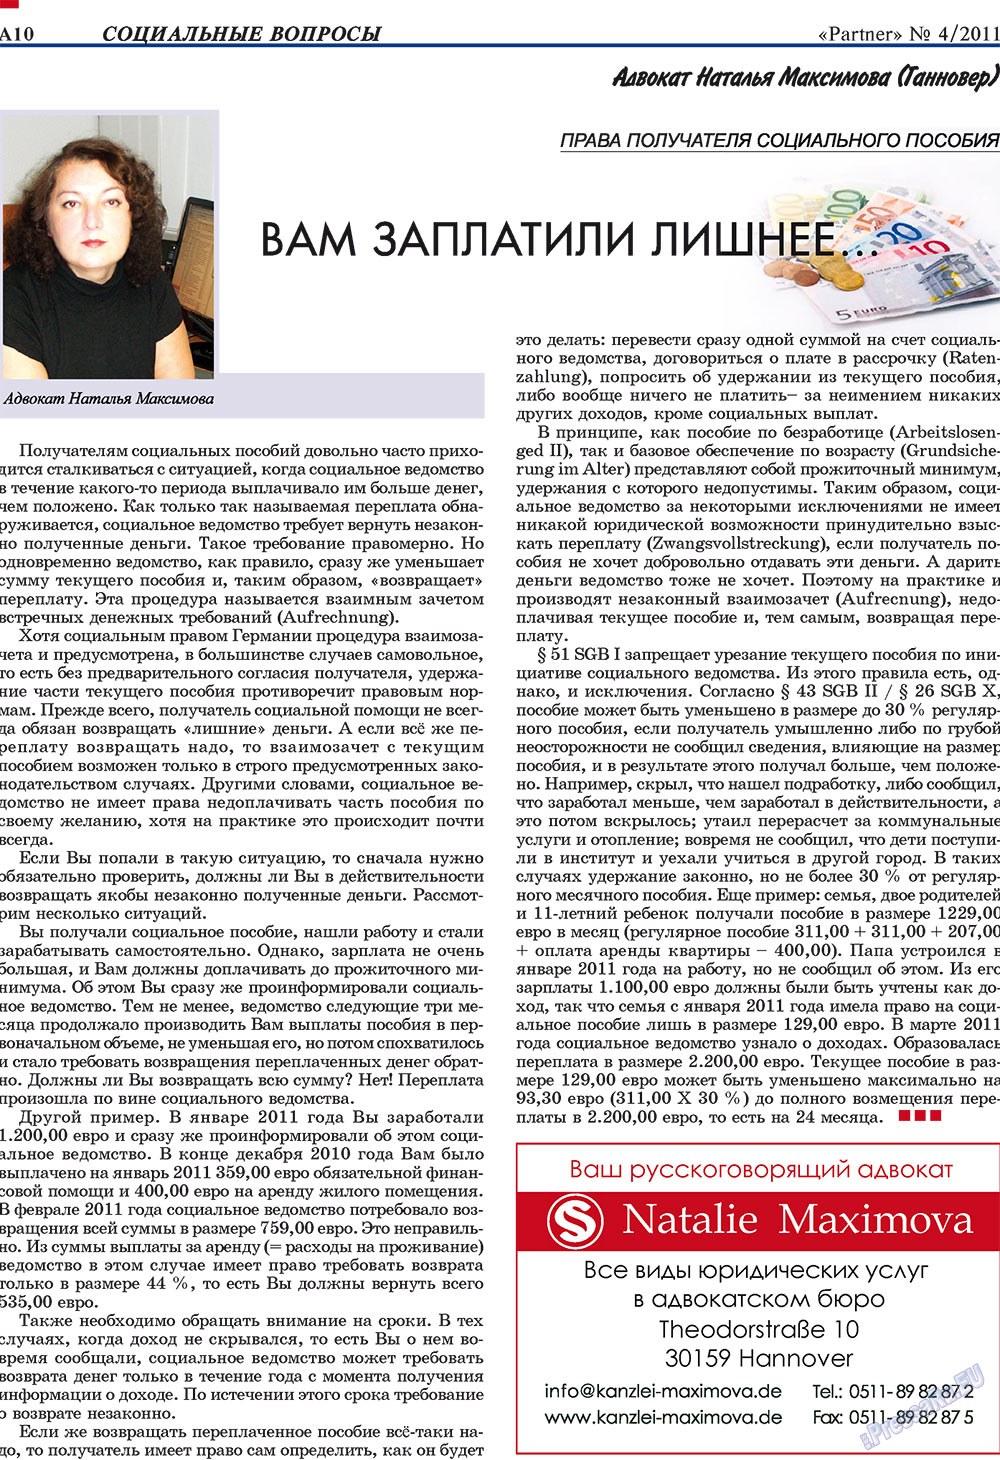 Партнер-север (журнал). 2011 год, номер 4, стр. 10